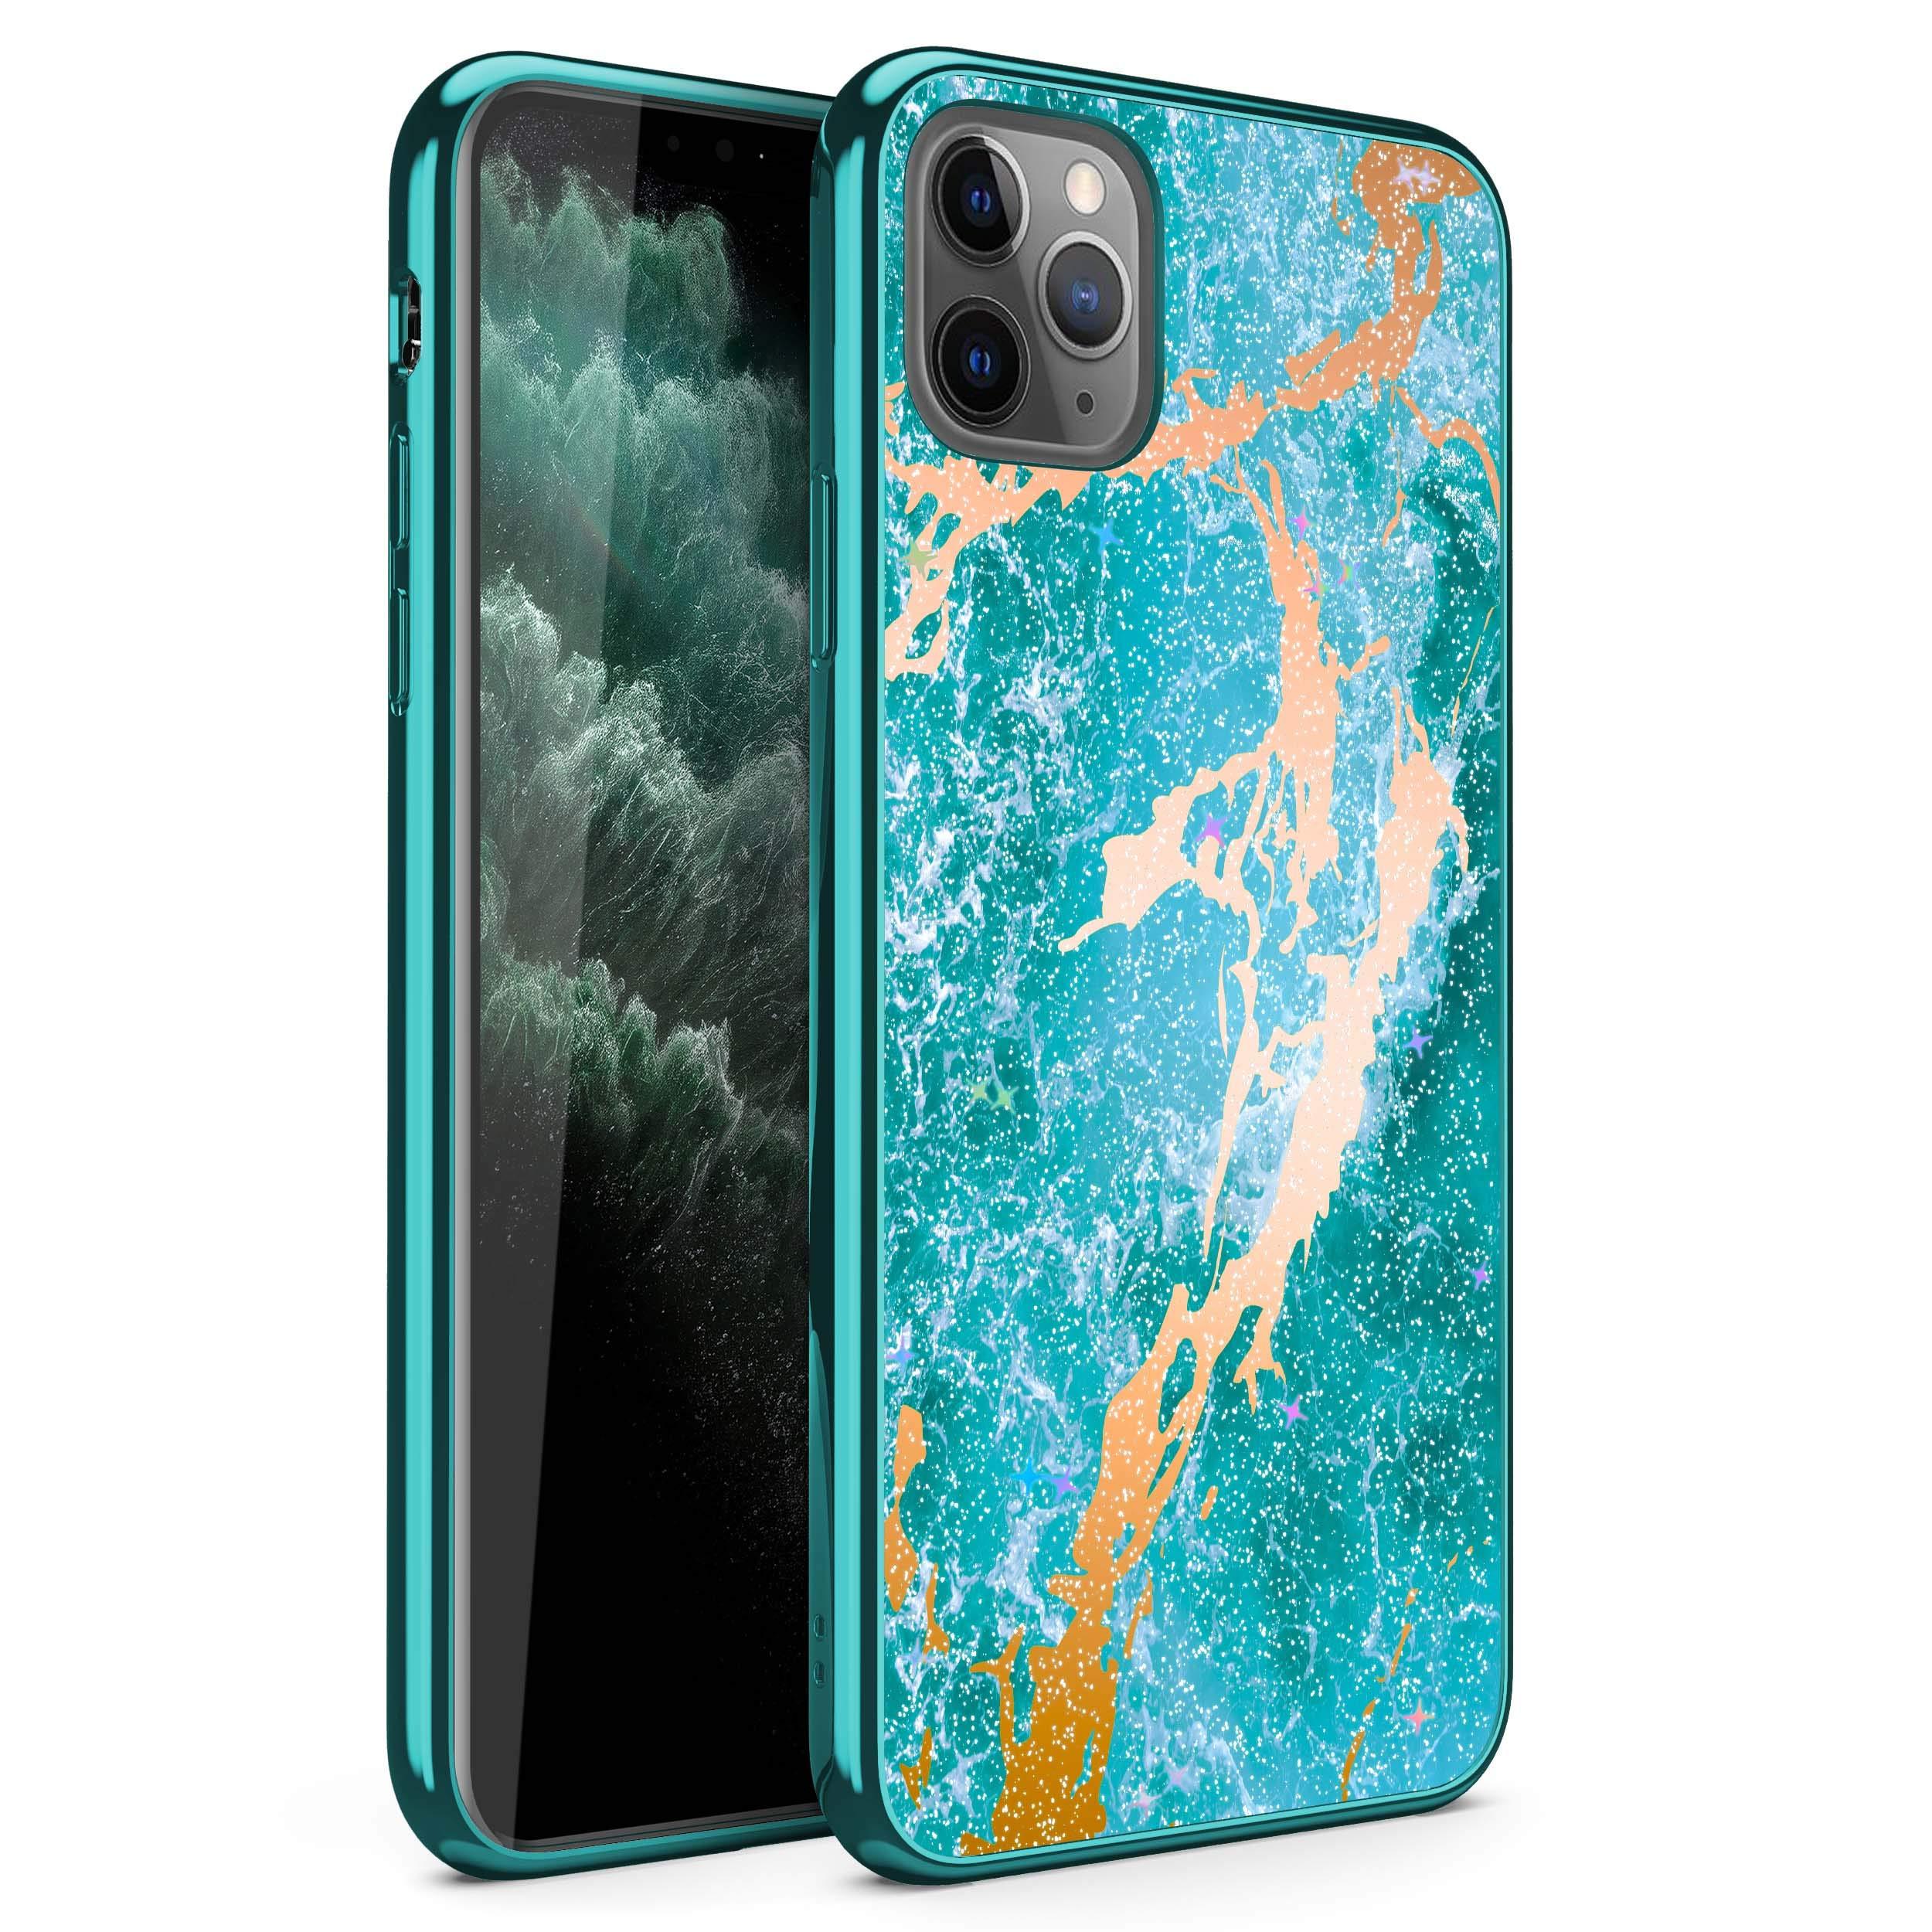 ZIZO Refine Series iPhone 11 Pro Max Case - Ultra Slim Thin Case - Oceanic